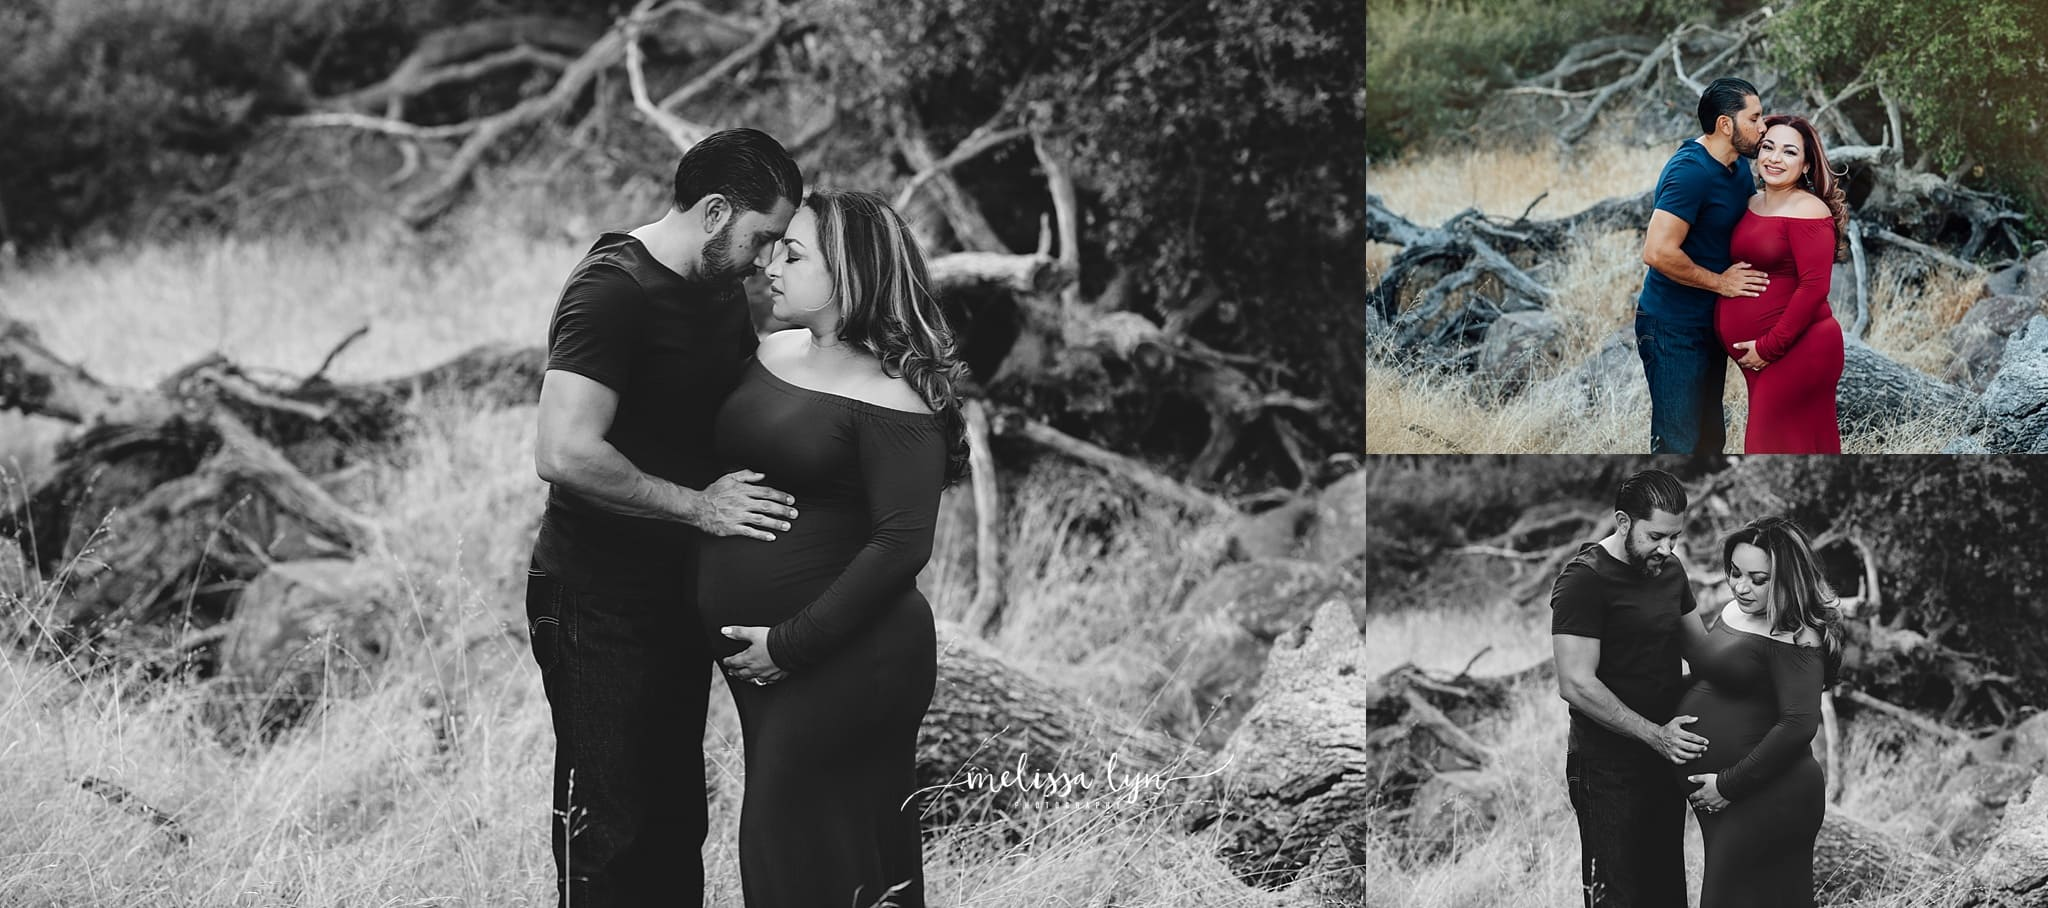 Melissa Lyn Photography - Temecula Maternity Photographer 39